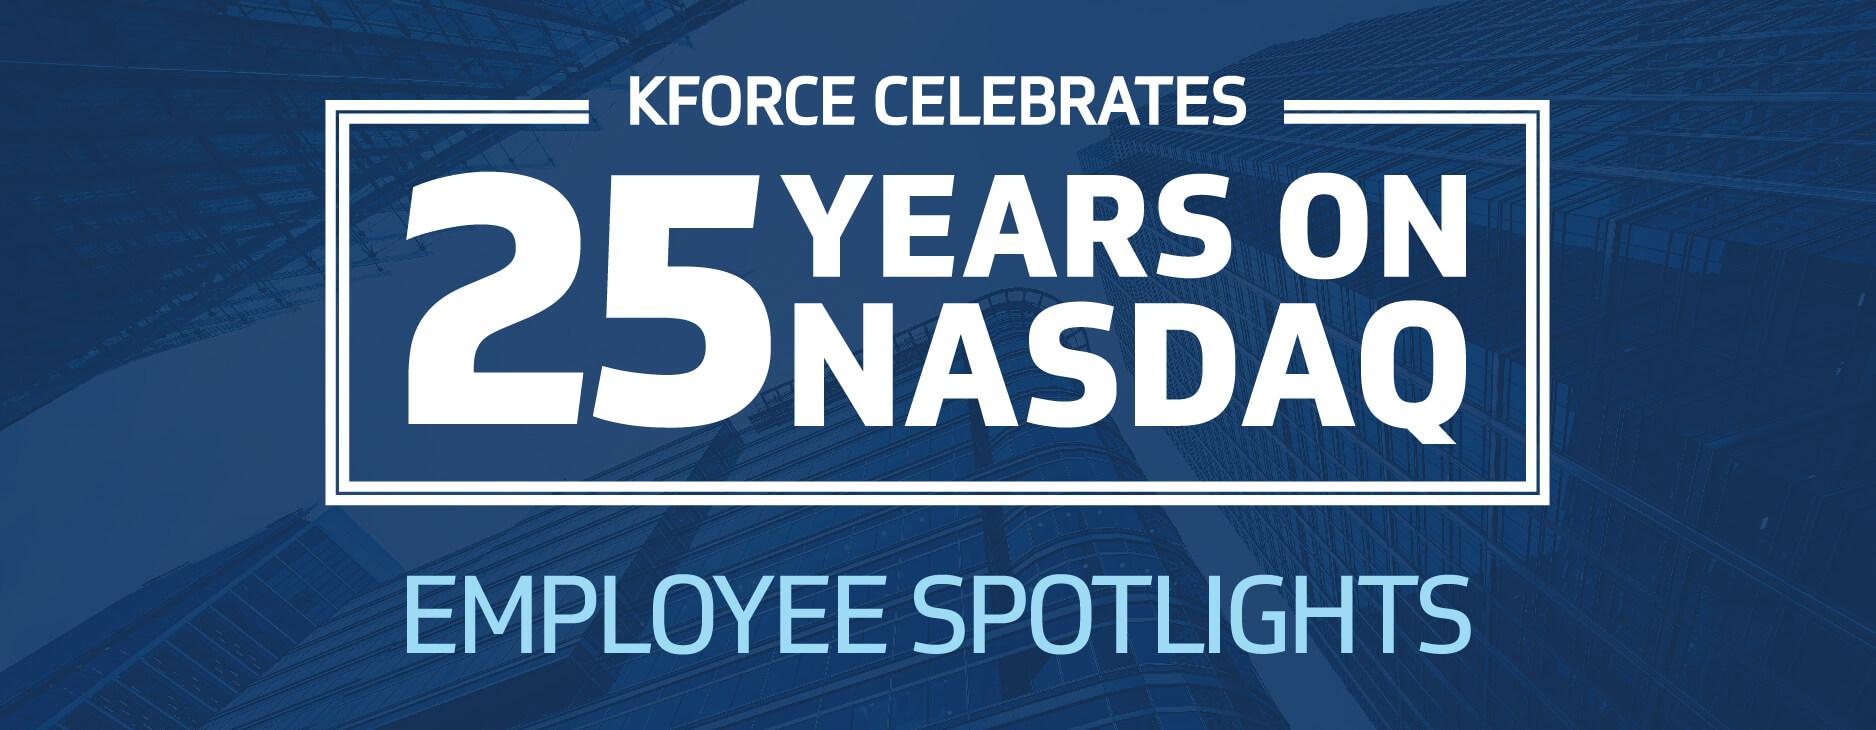 Kforce Celebrates 25 Years on NASDAQ